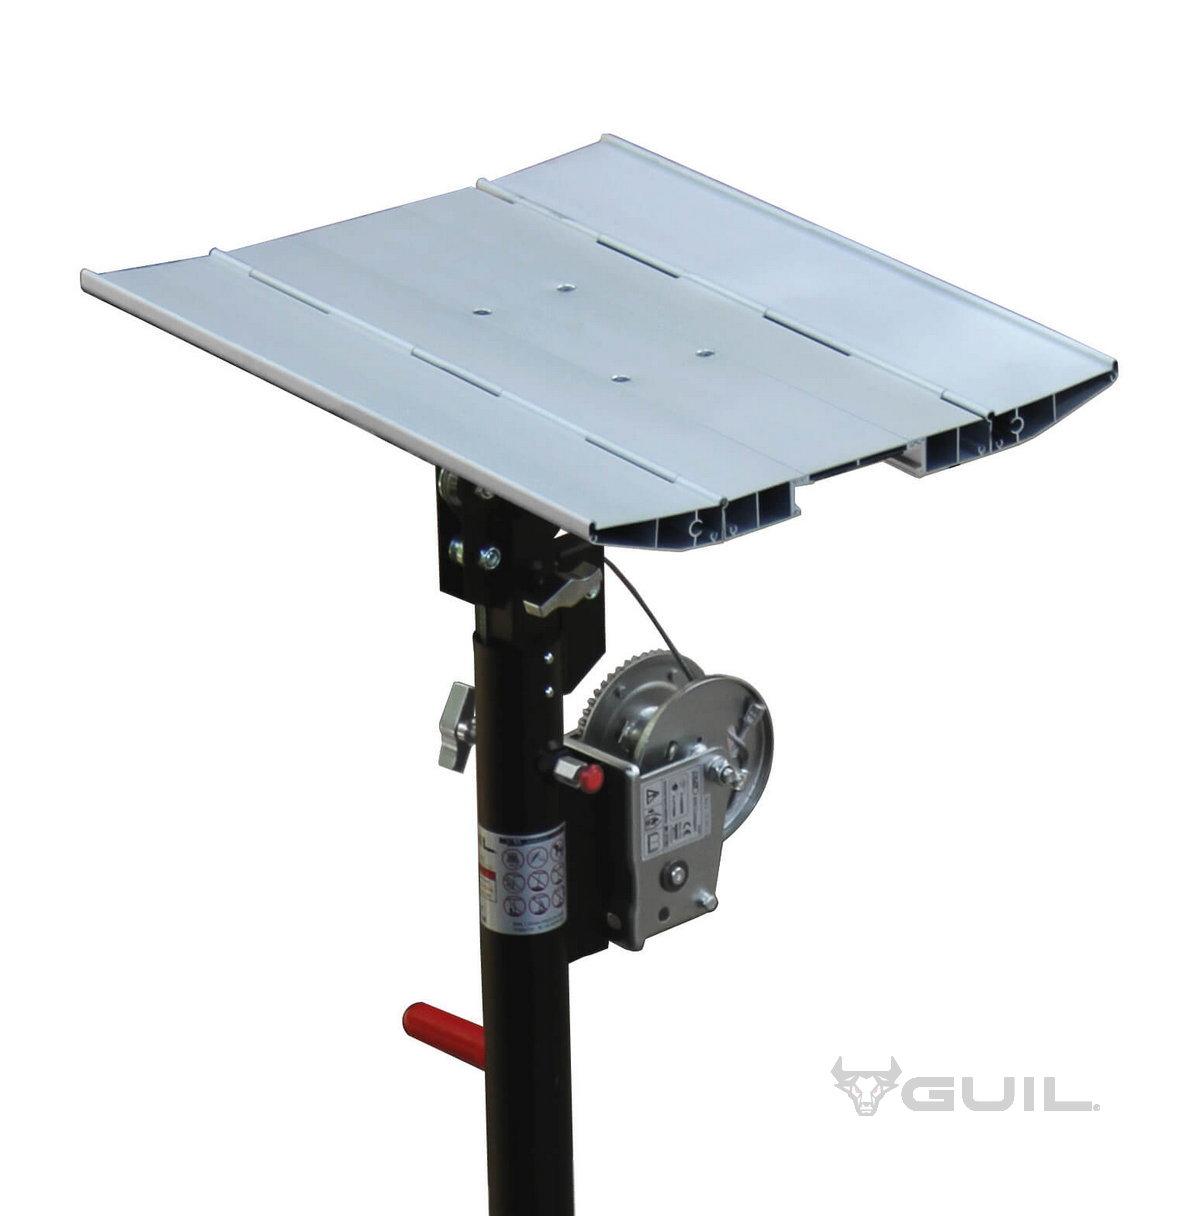 Platform aluminium (450x435) ELC-700,710 (1)